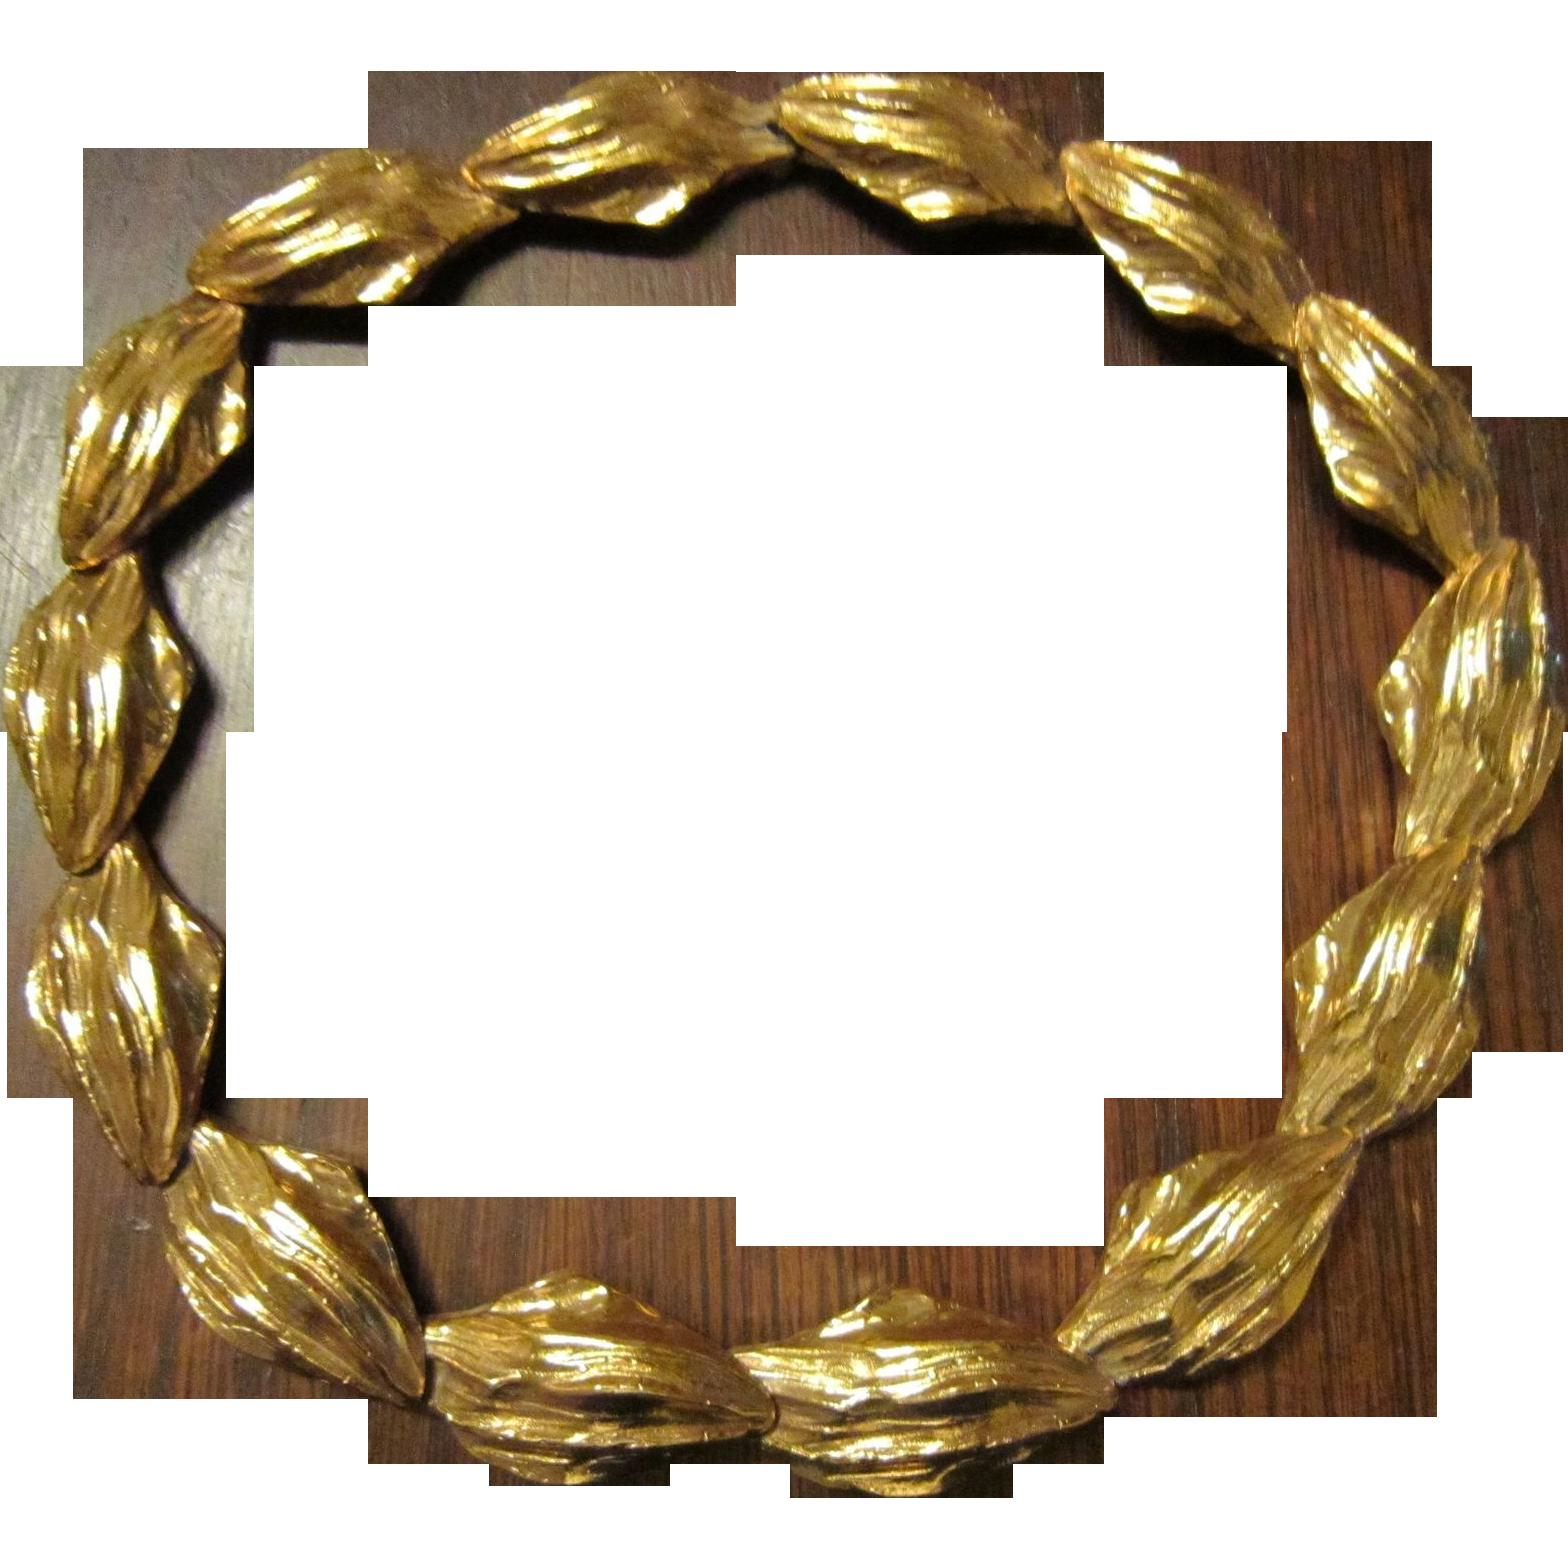 SAVE $150: Yves Saint Laurent  Gold Plated Leaf Necklace and Bracelet